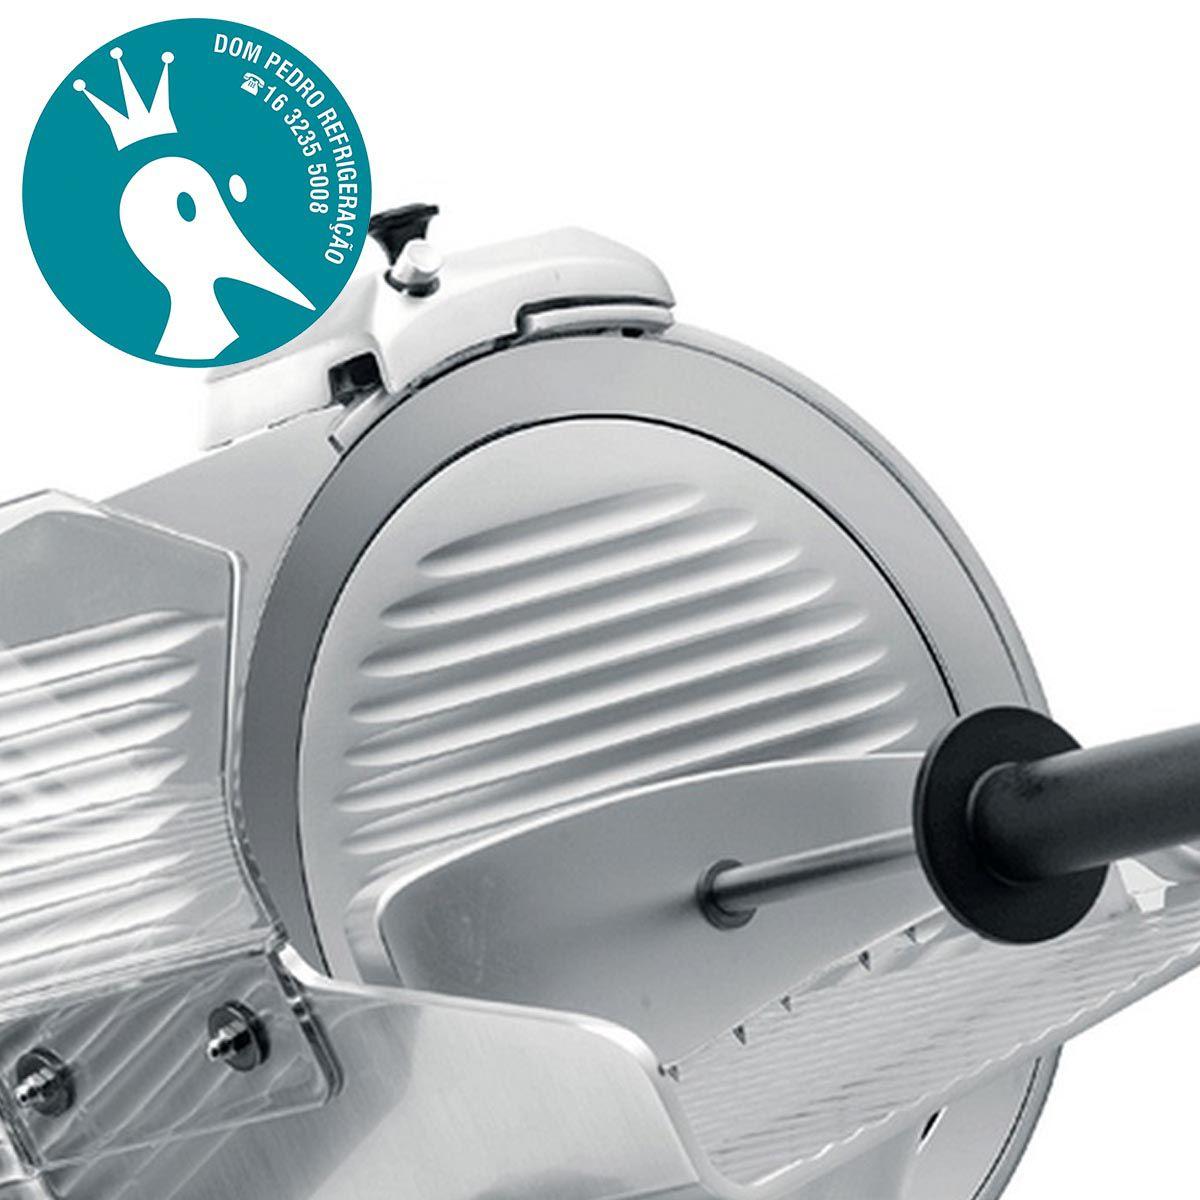 Cortador Fatiador de Frios Semi Atomático Mirra 300 220V - Sirman